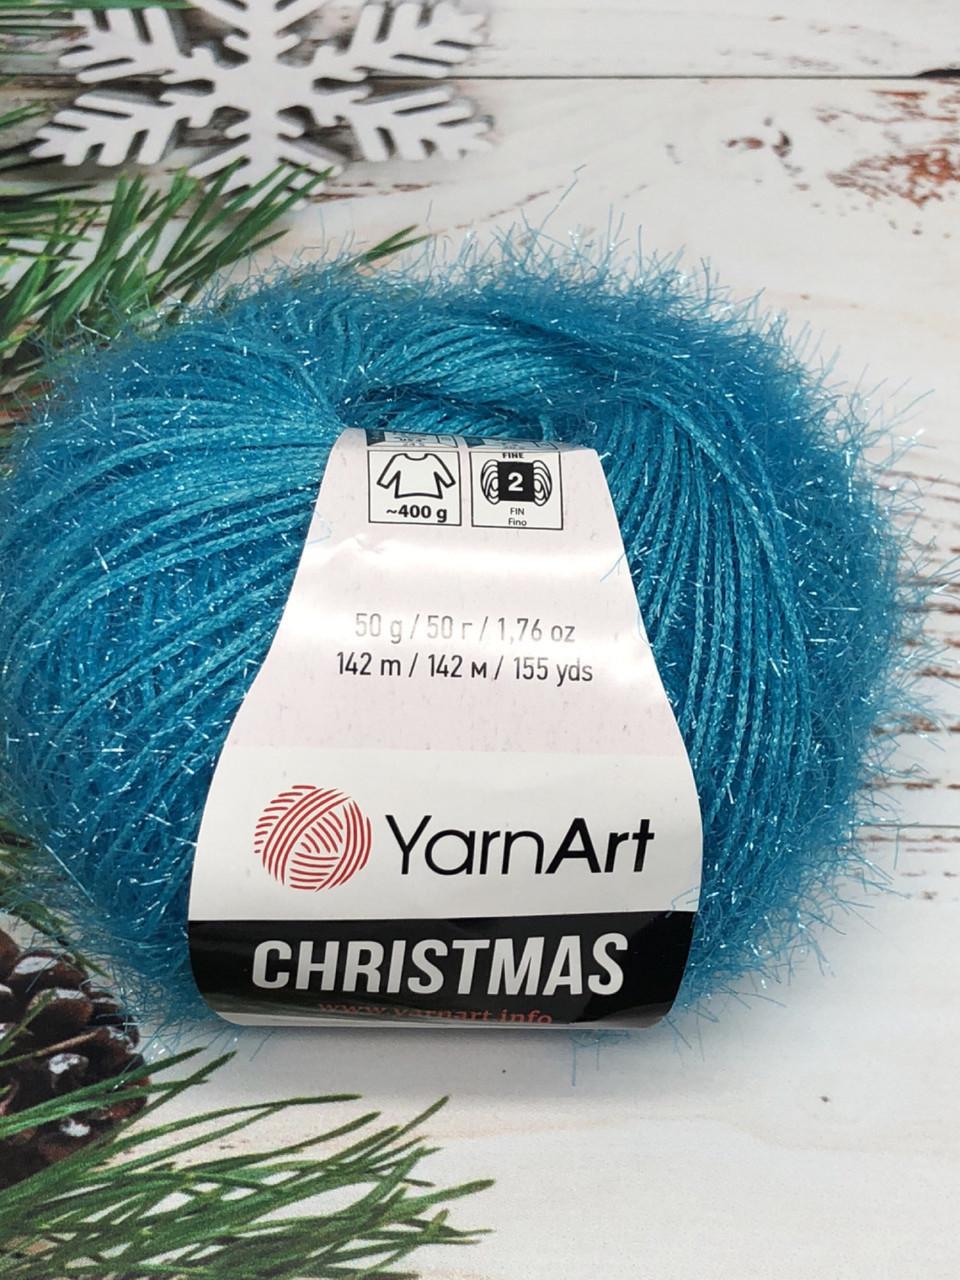 Пряжа ЯрнАрт Кристмас YarnArt Christmas, цвет №04 бирюза